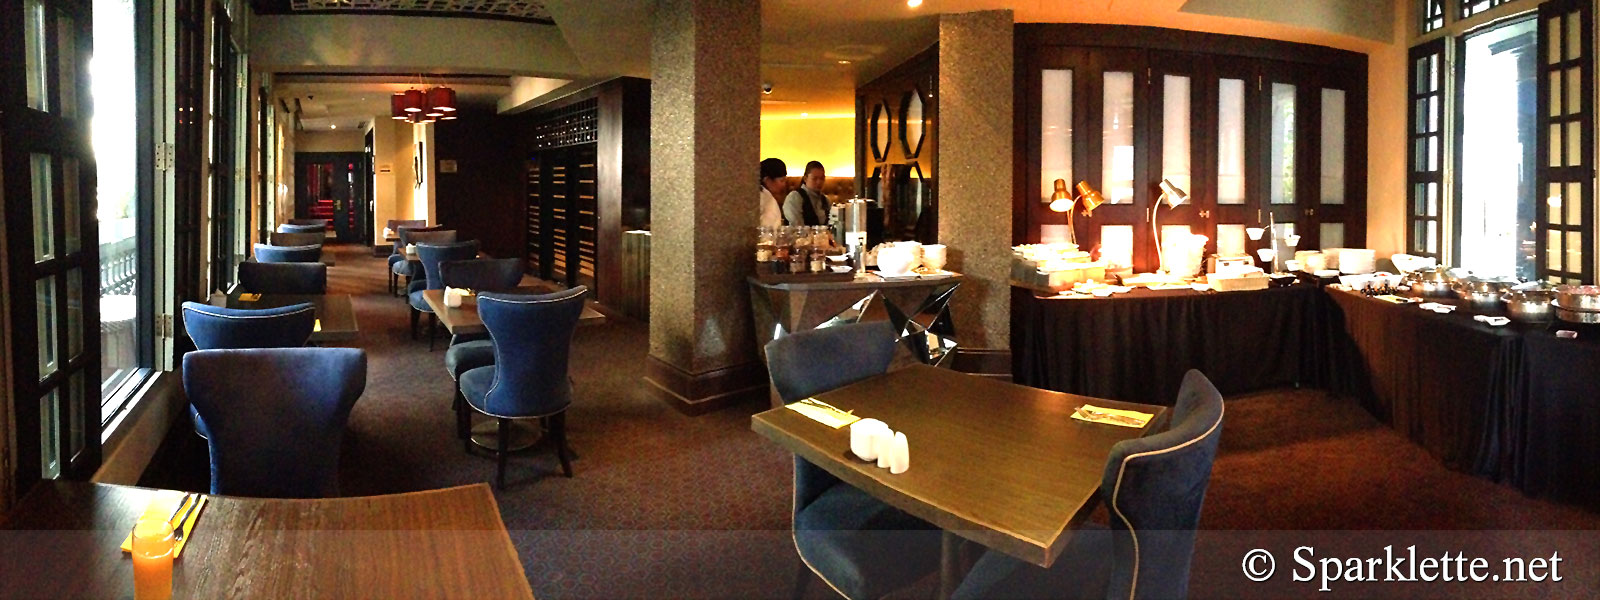 The Scarlet Hotel Splendour Suite Restaurant